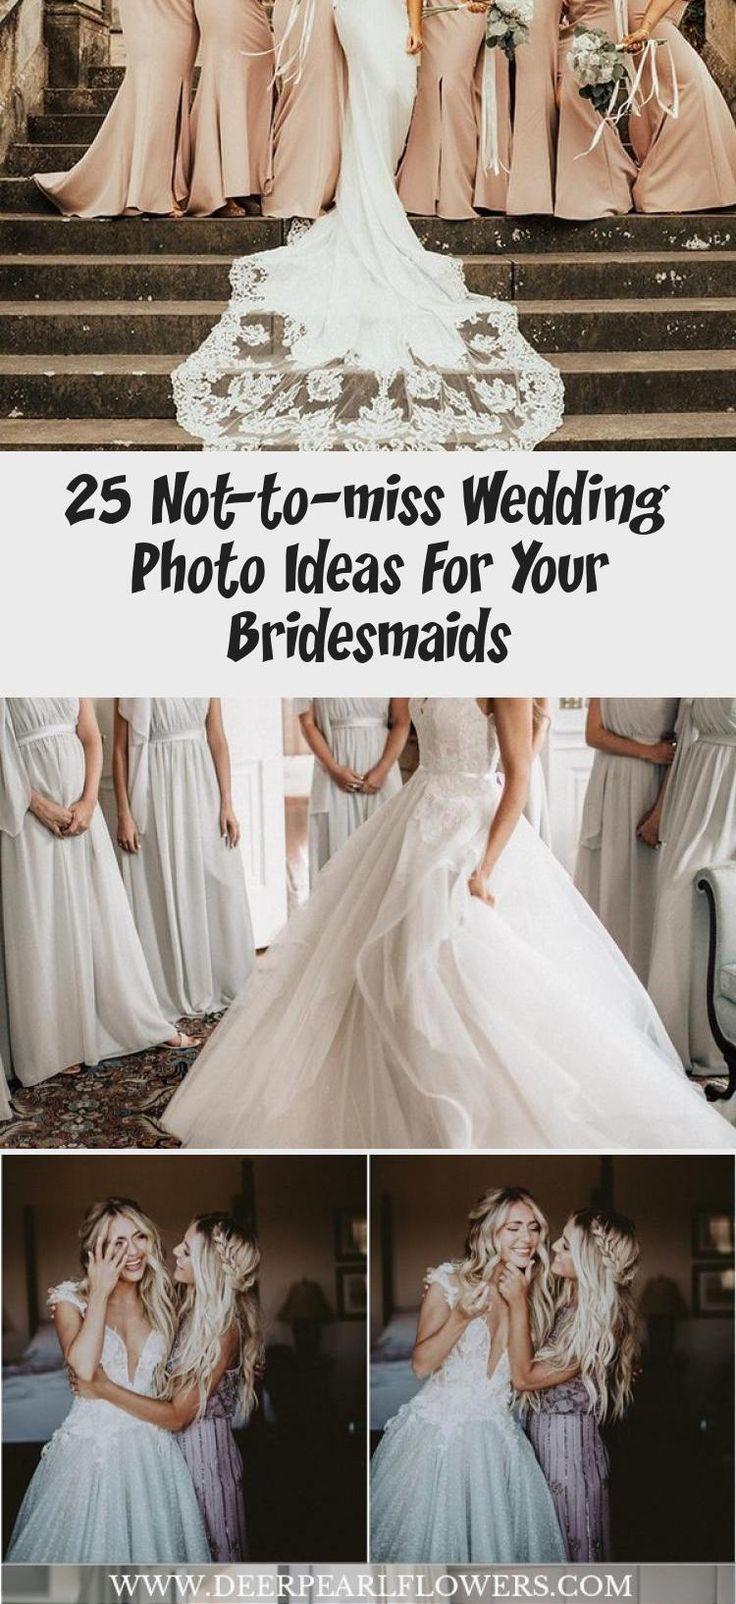 Wedding Photo Ideas For Your Bridesmaids  #wedding #weddingideas #weddingphotos #deerpearlflowers #BridesmaidDressesIndian #BridesmaidDressesSpring #BridesmaidDressesLace #SimpleBridesmaidDresses #BridesmaidDressesSequin